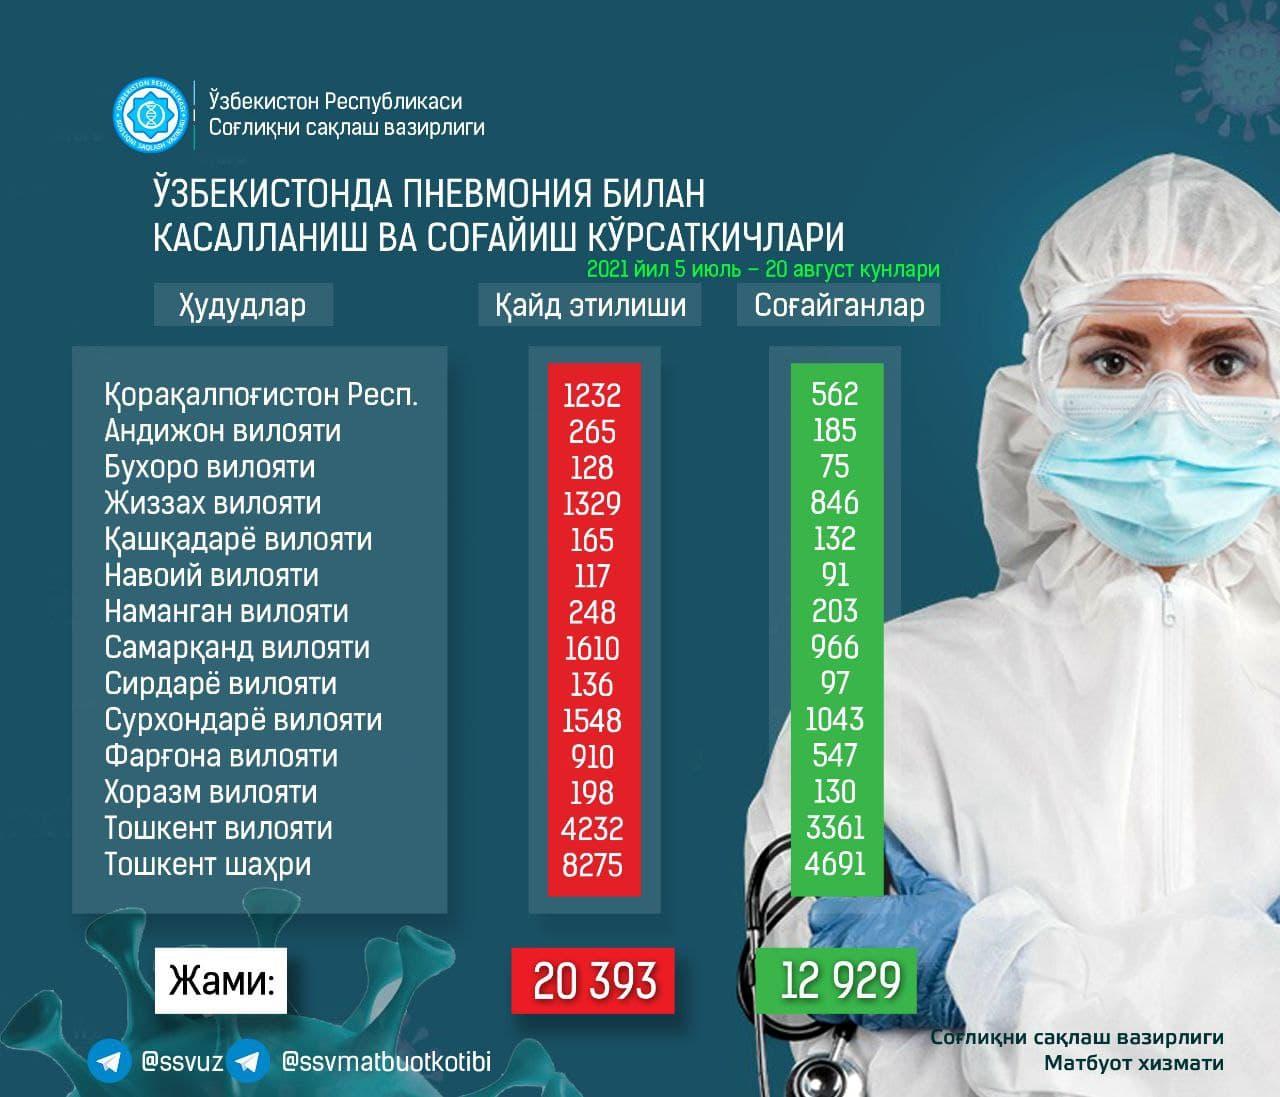 В Узбекистане опубликовали обновленную статистику по пневмонии